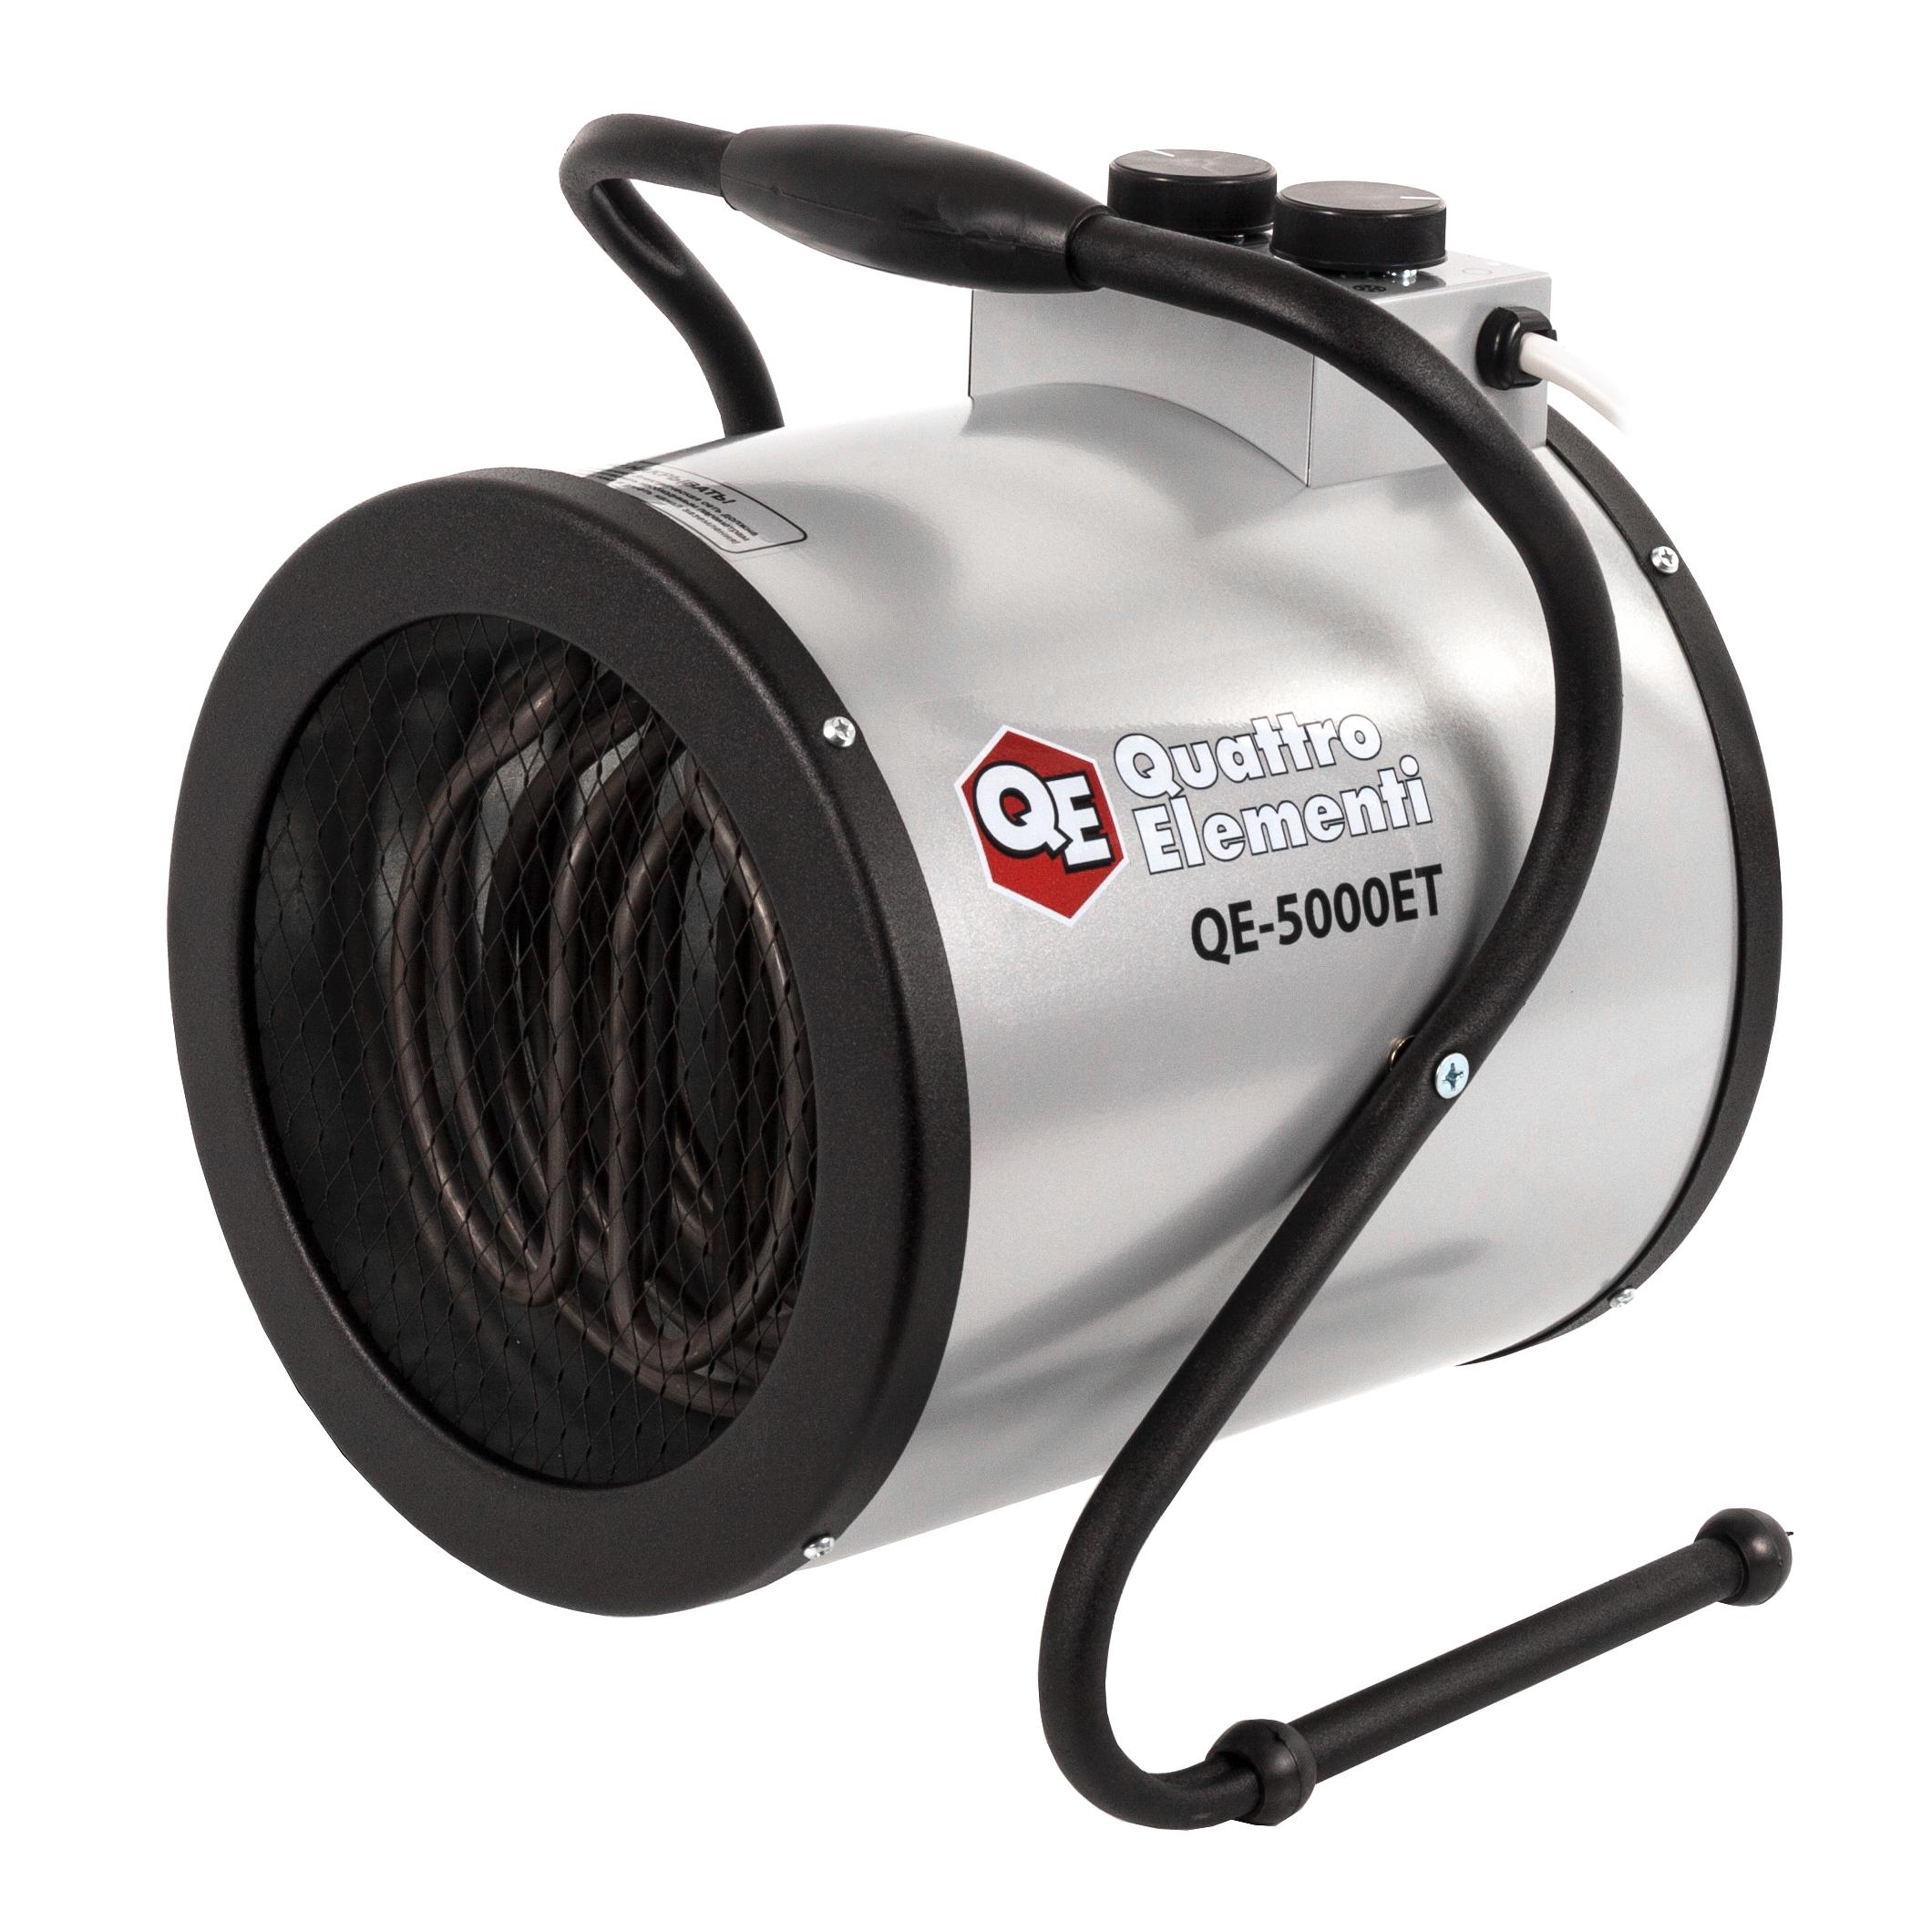 Электрическая тепловая пушка Quattro elementi Qe-5000et